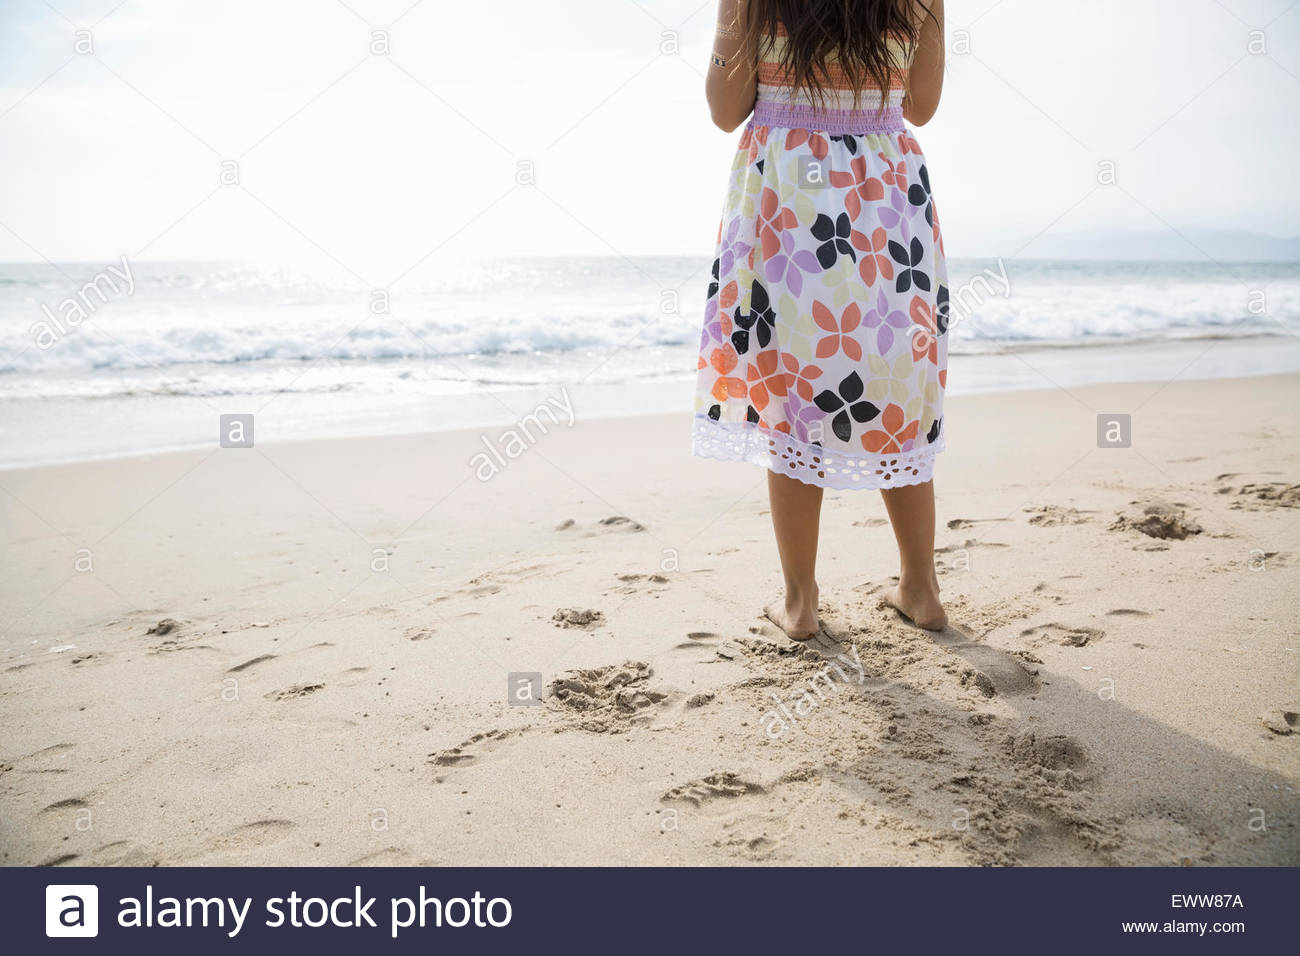 Fille en robe soleil sur sunny beach Photo Stock